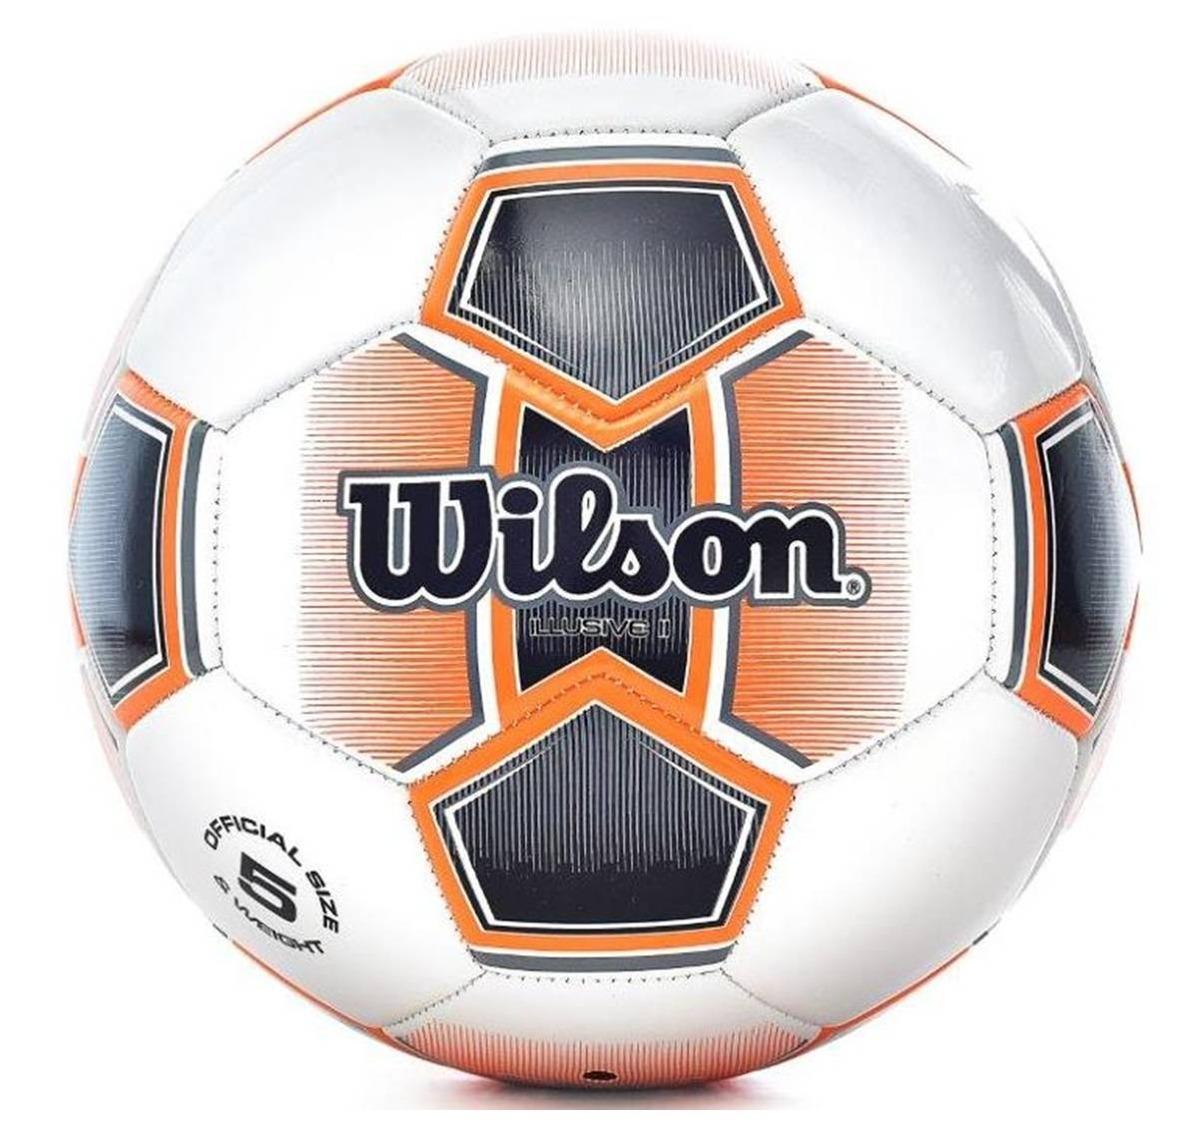 bola de futebol wilson illusive ii tamanho 5 - branca com la. Carregando  zoom. 2bb9f367ab2f4